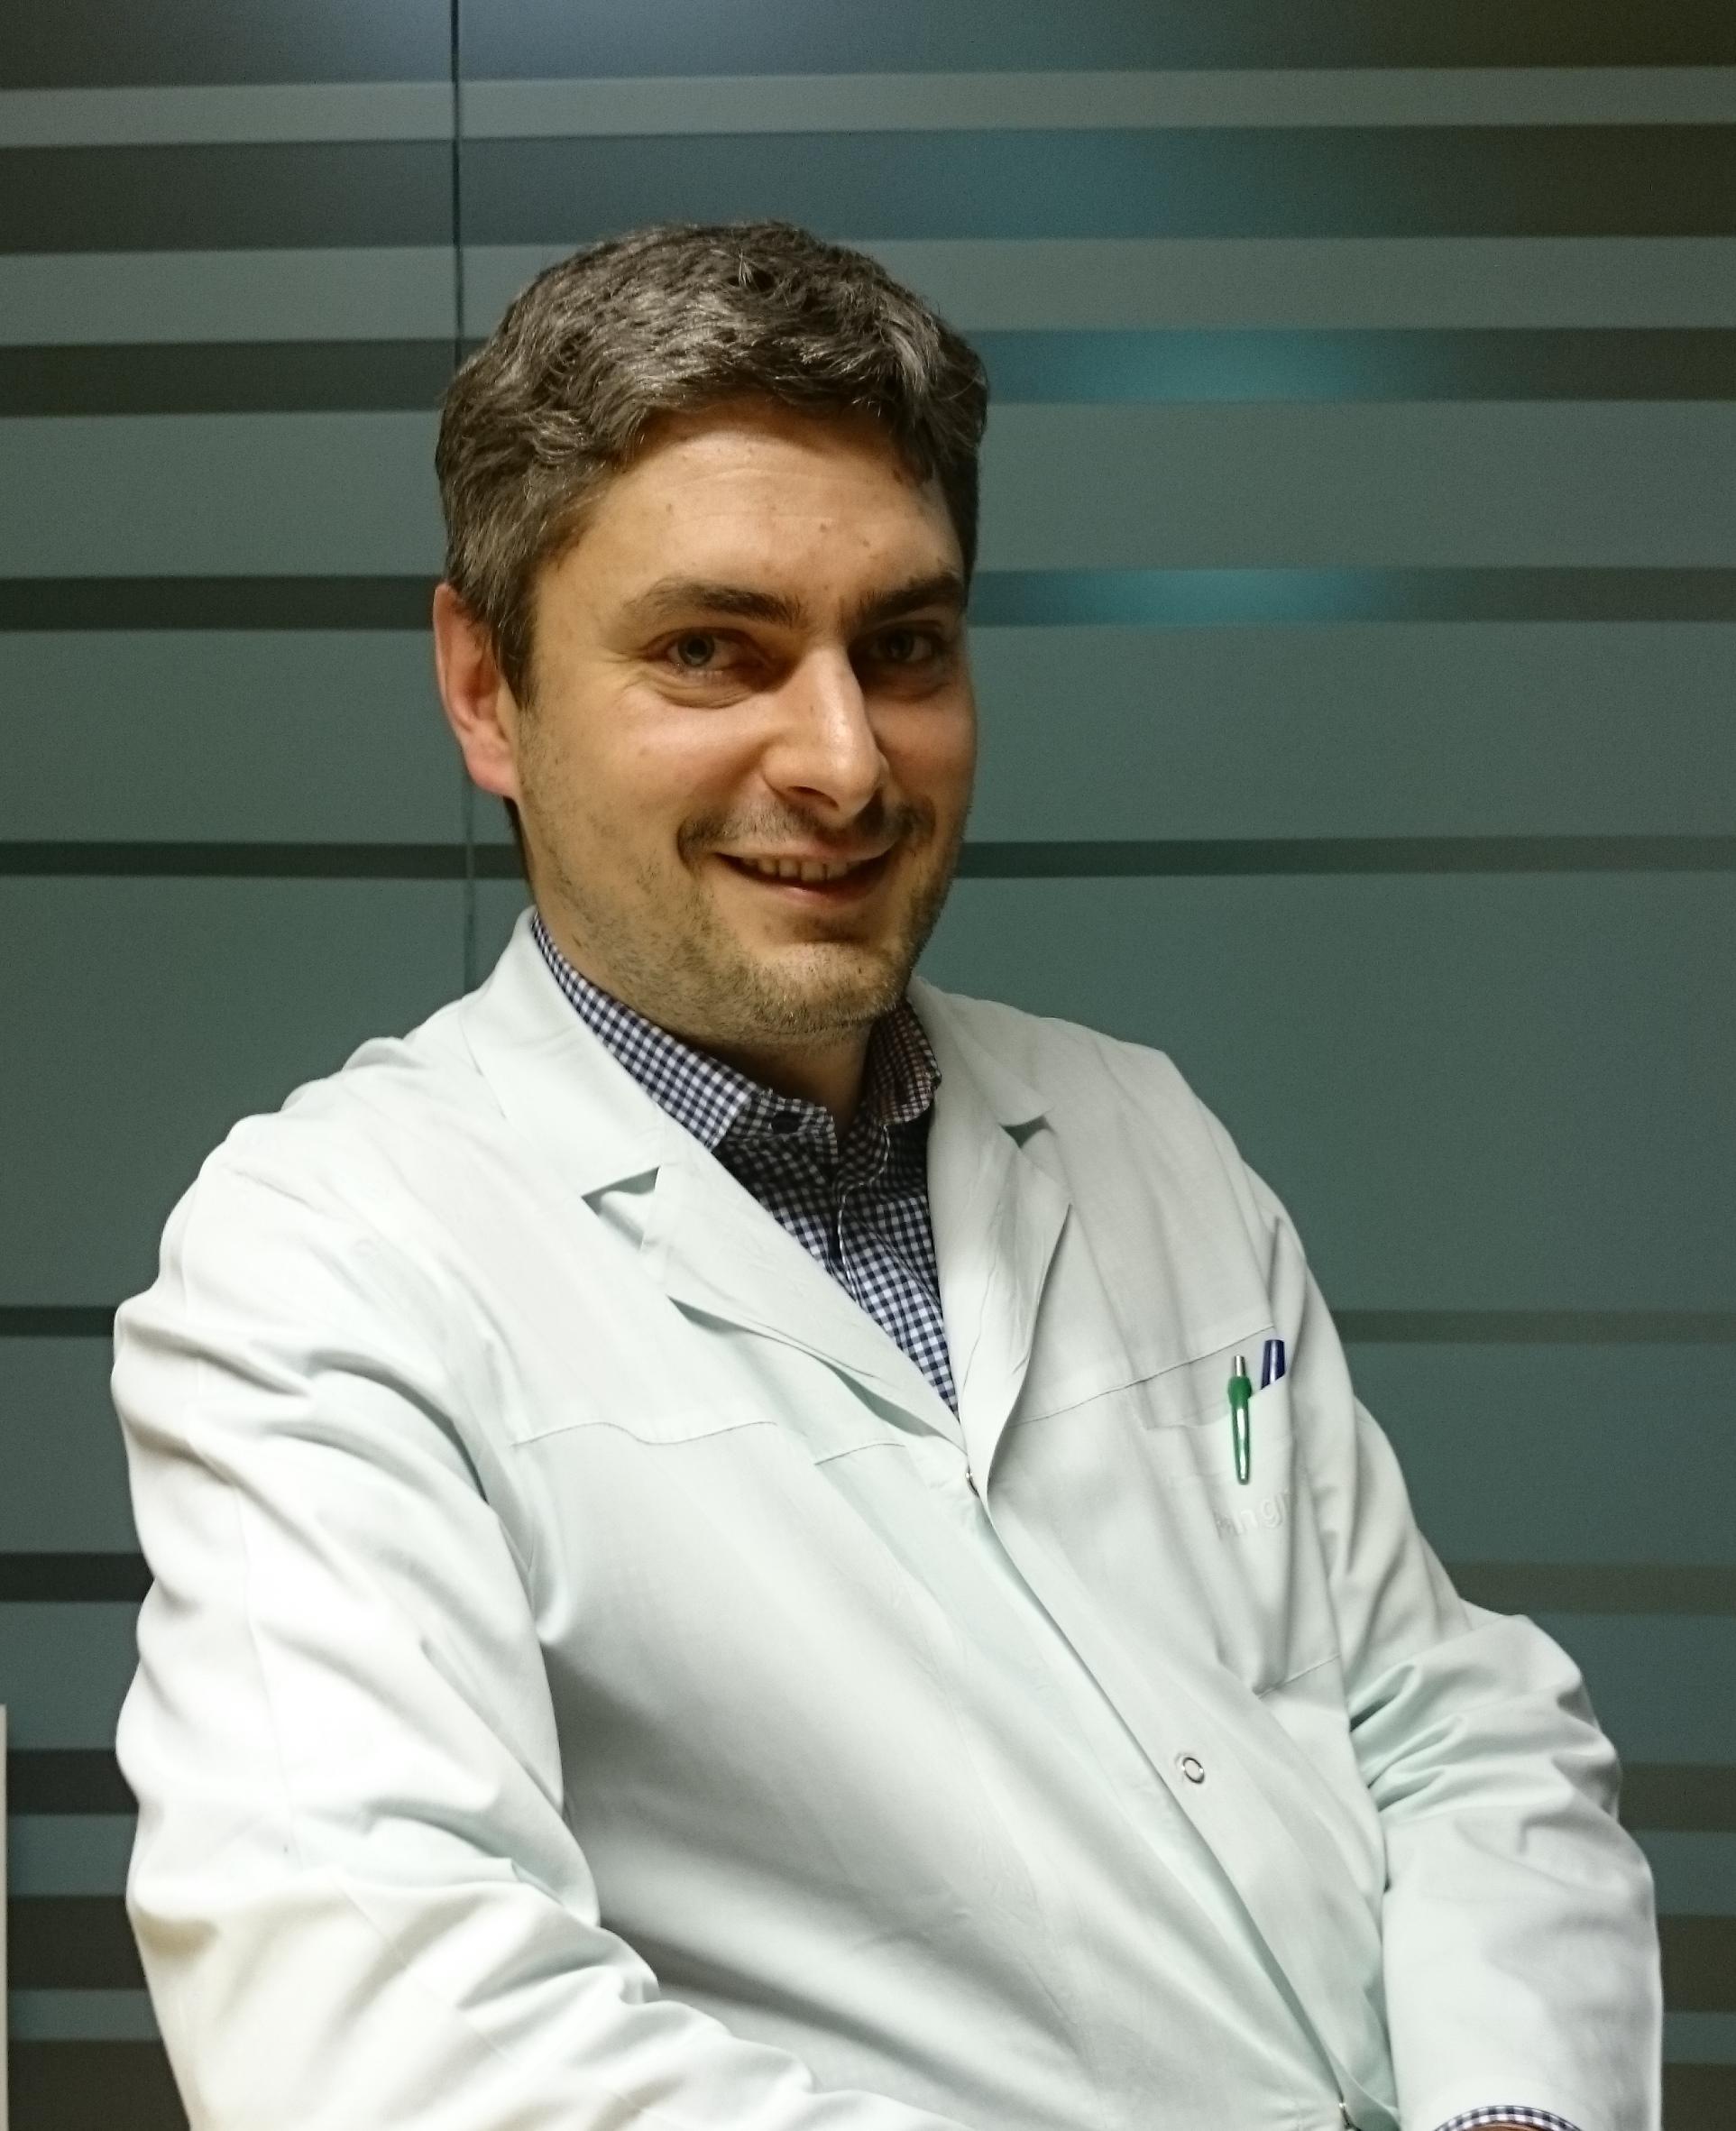 VULSK traumatologas ortopedas Liudvikas Kervys (santa.lt nuotr.)